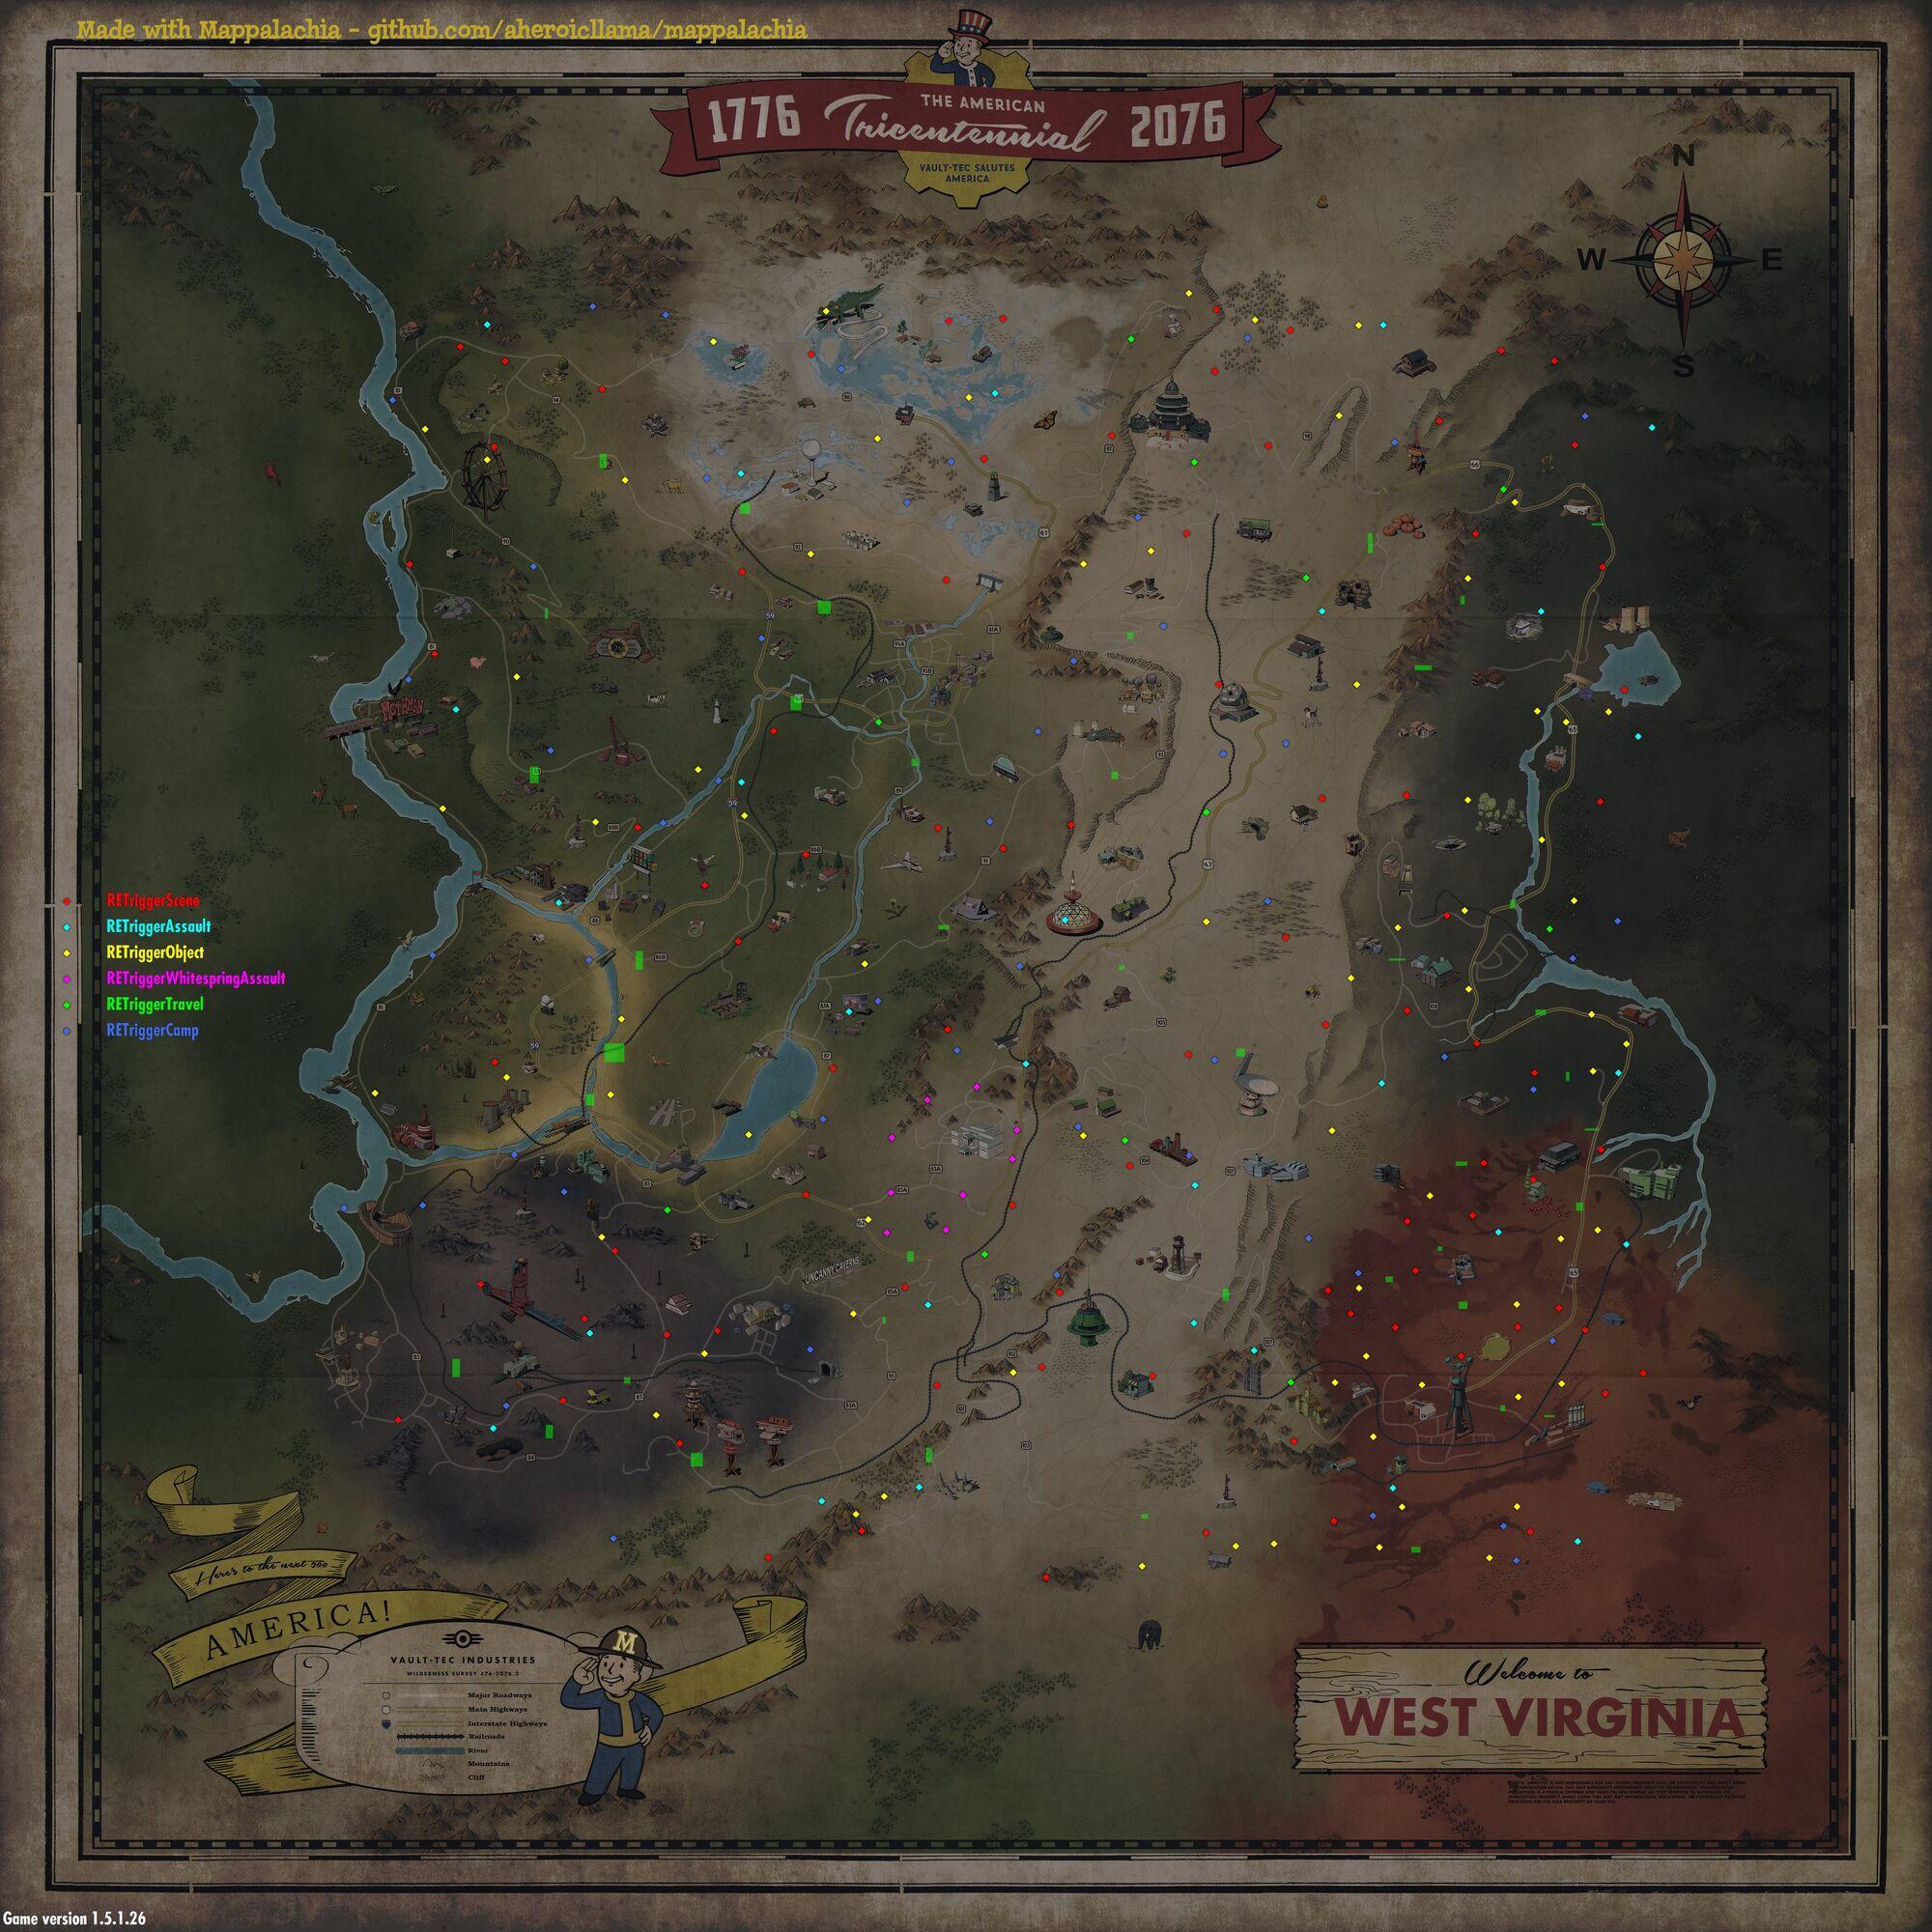 Fallout 76 random encounters | Fallout Wiki | FANDOM powered